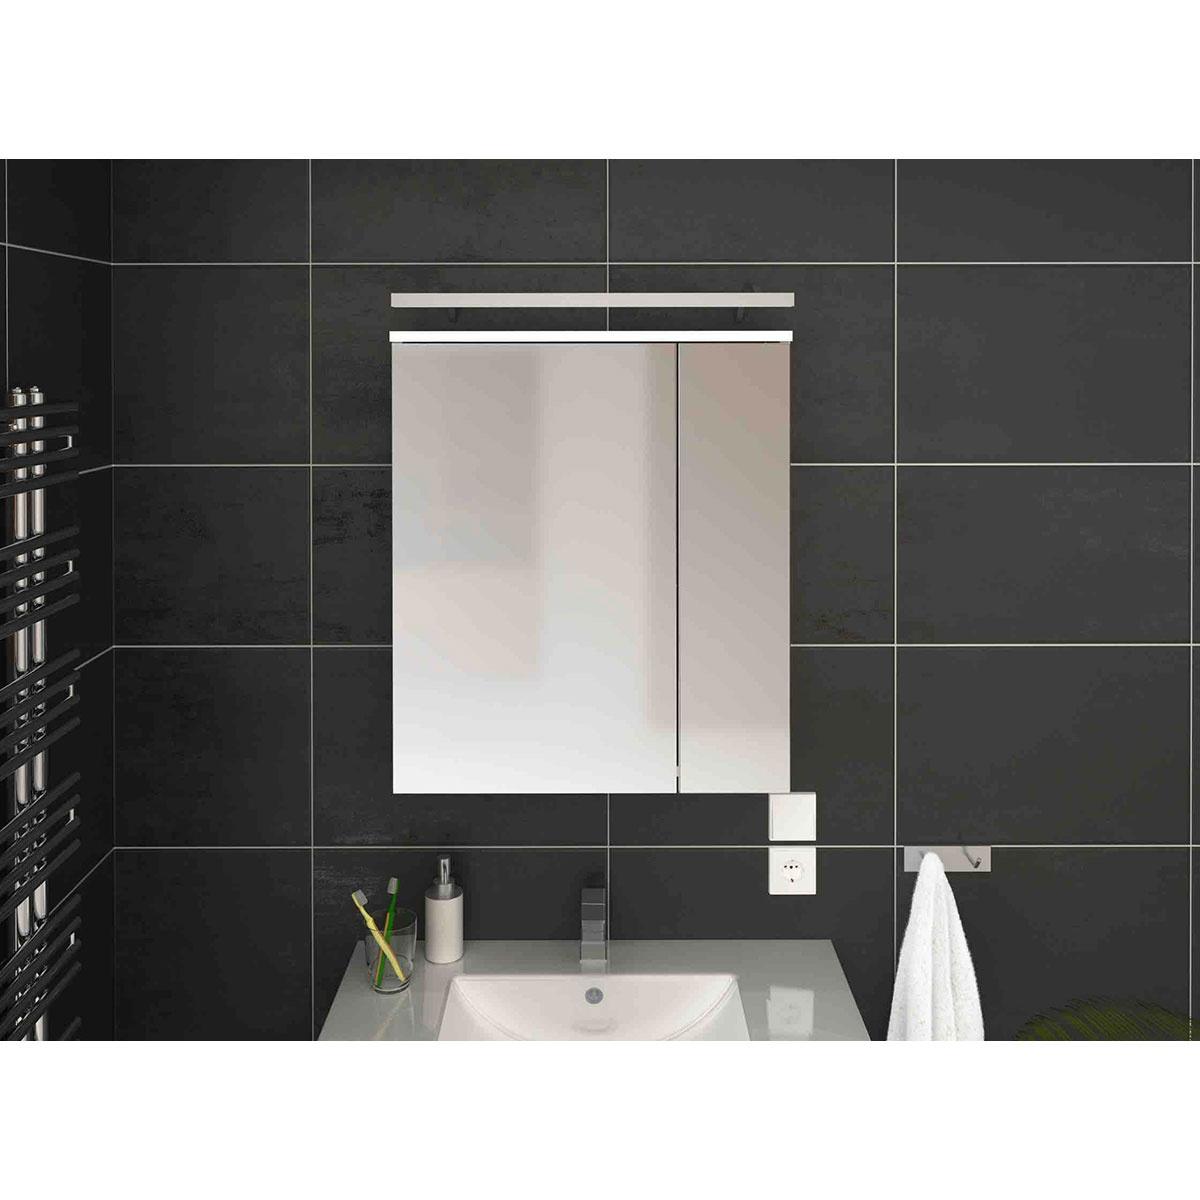 armoire pharmacie avec miroir blanc homebain vente en ligne meubles de salle de bain. Black Bedroom Furniture Sets. Home Design Ideas